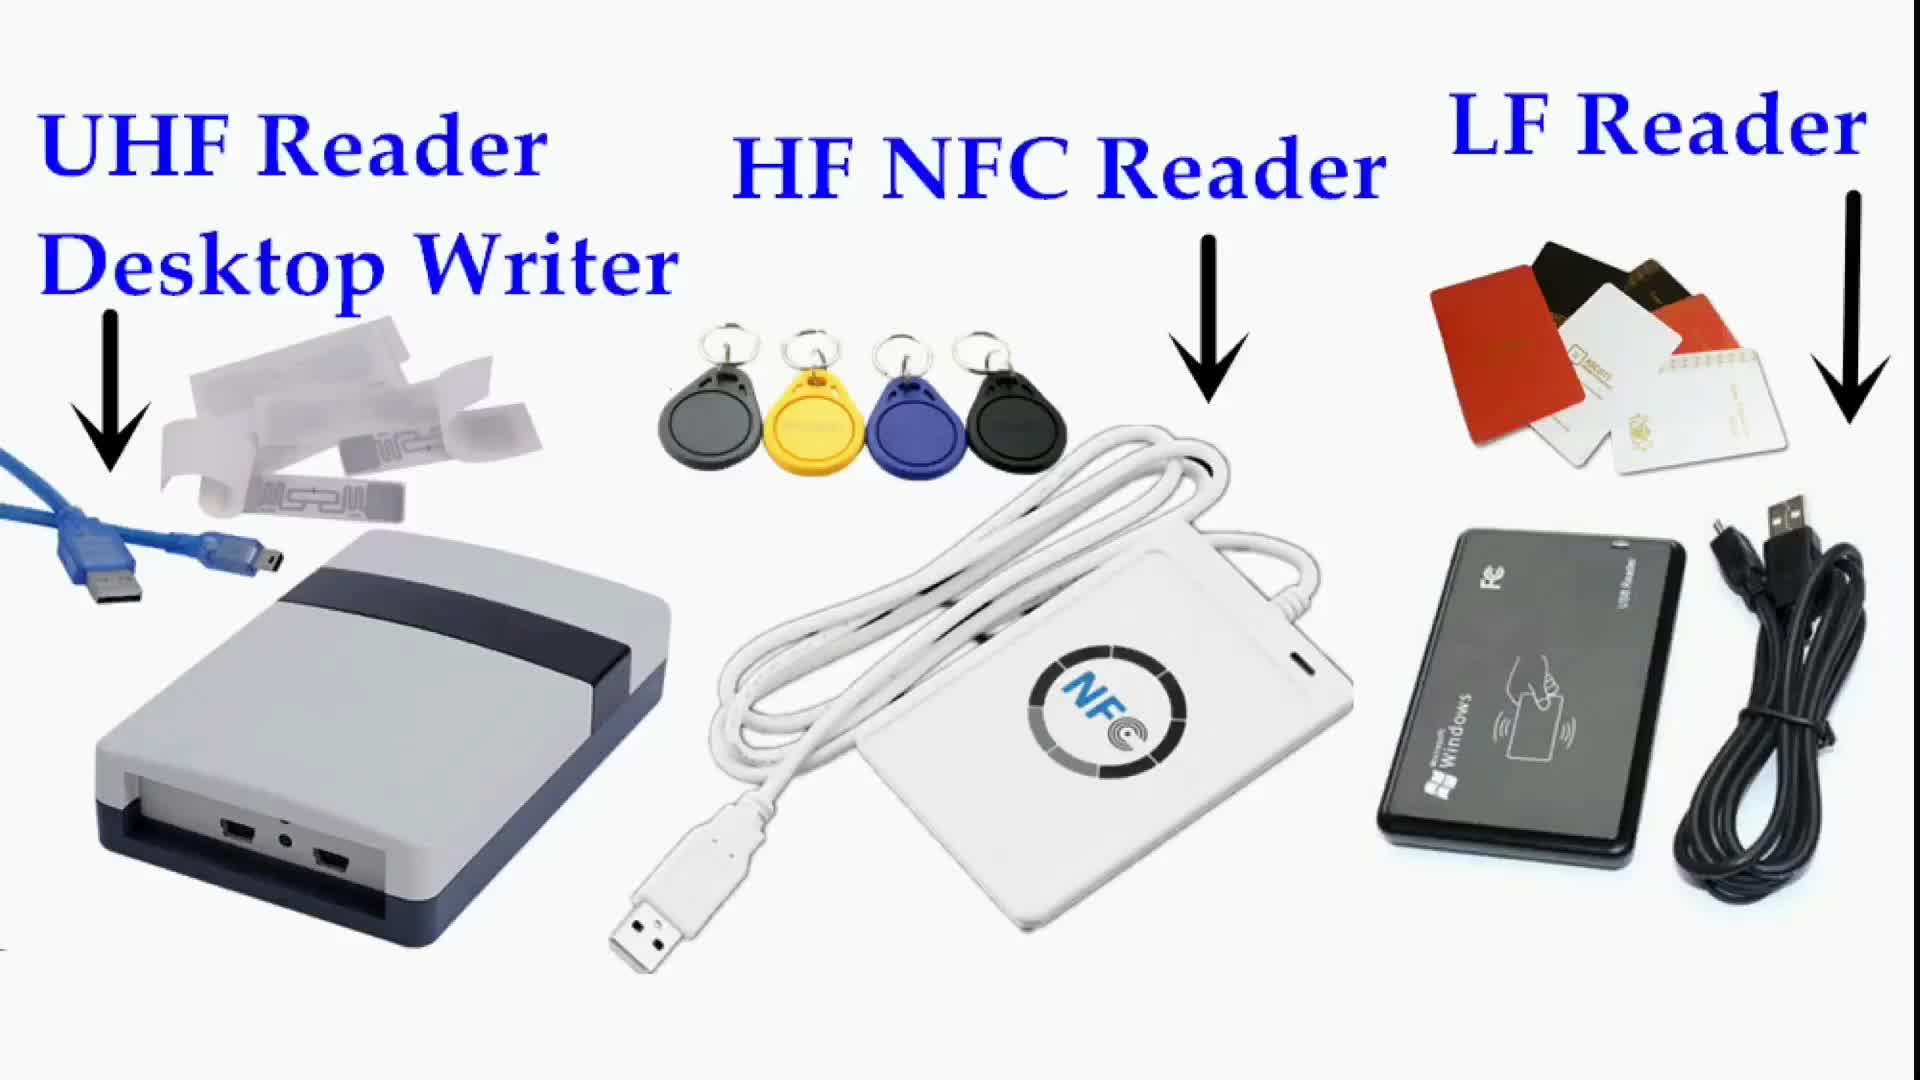 860-960mhz handheld long range read distance uhf rfid reader with impinj R2000 chip